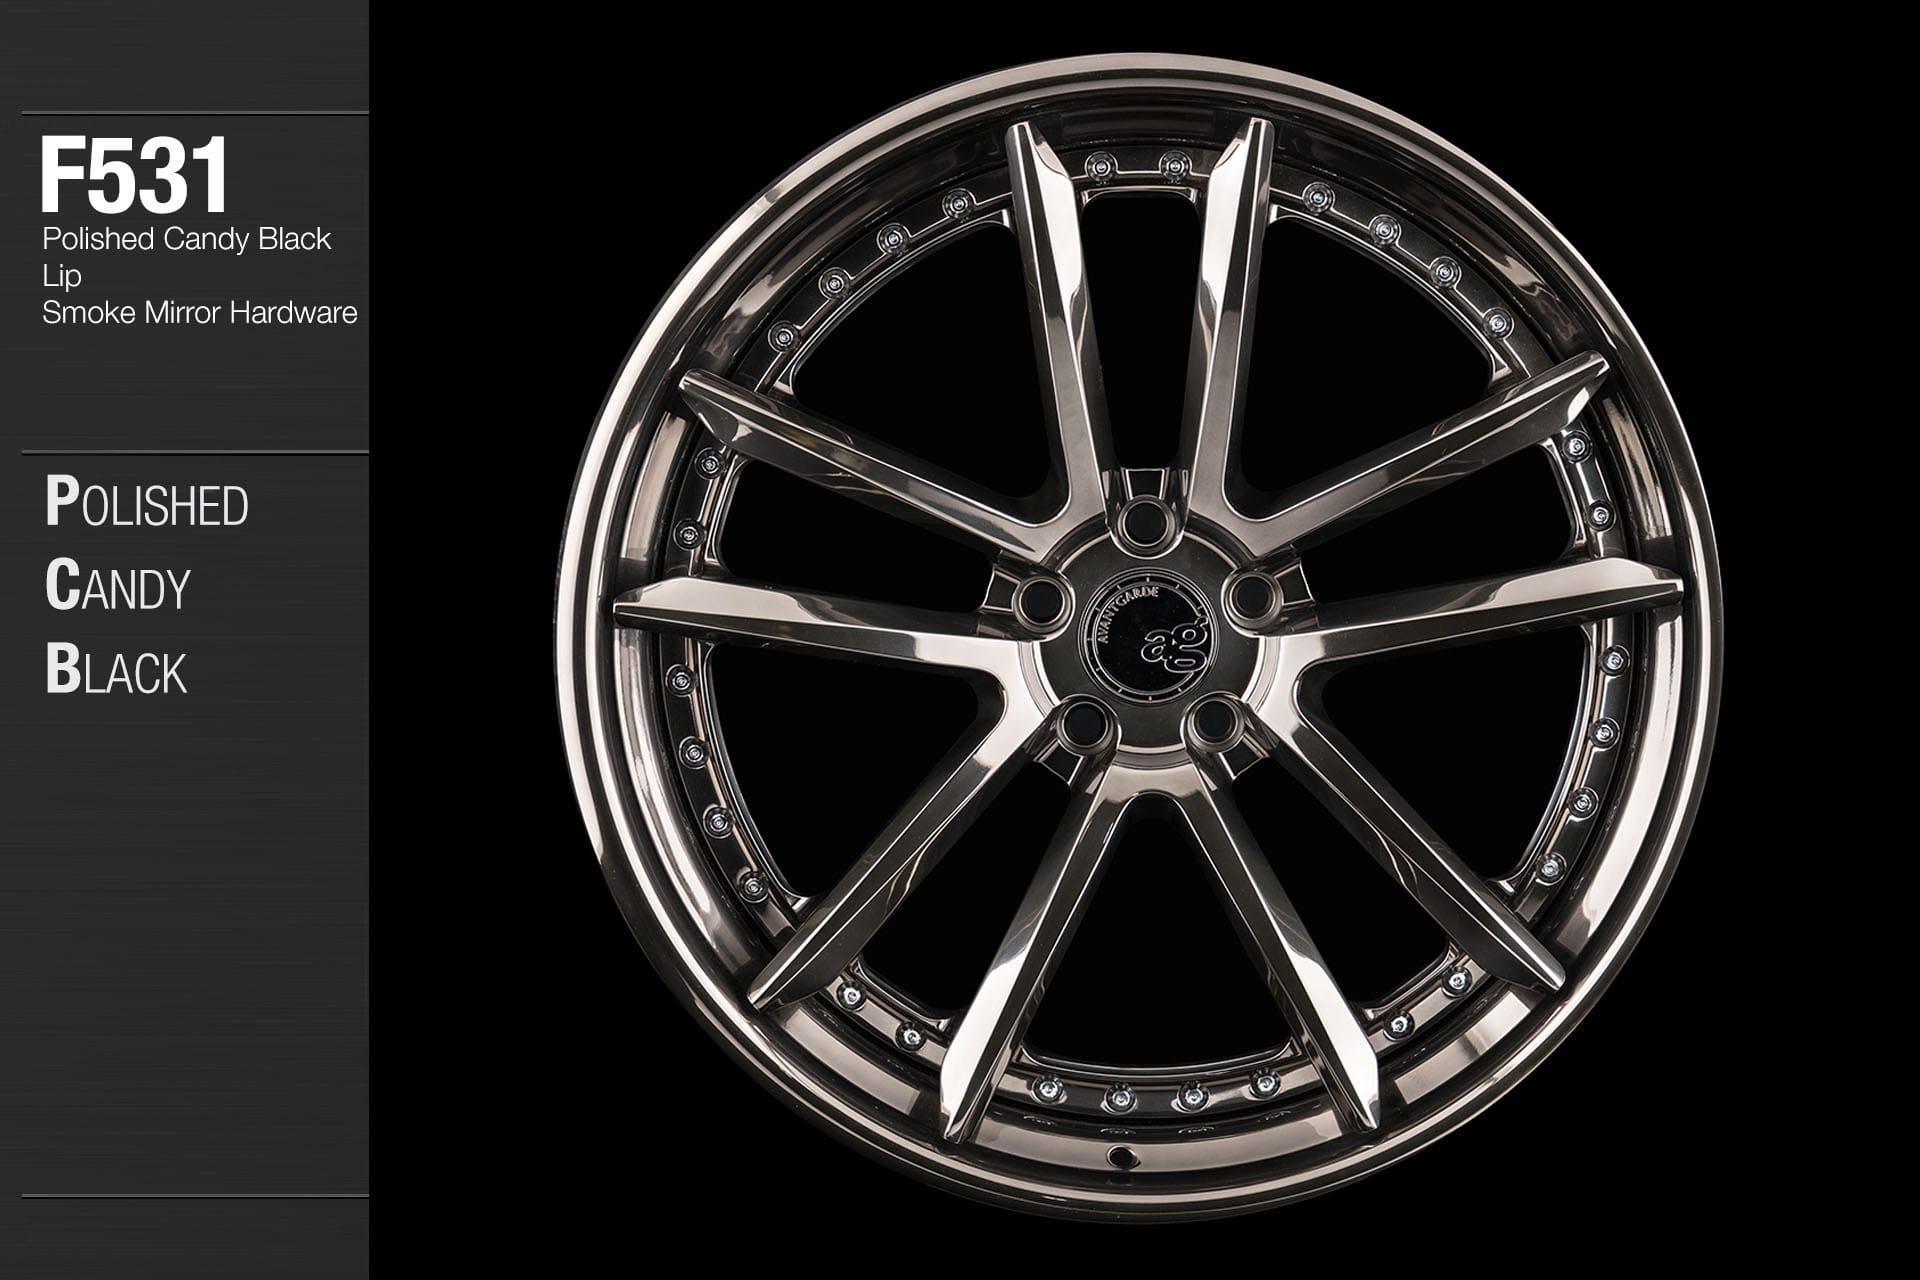 avant-garde-ag-wheels-f531-polished-candy-black-face-lip-smoke-mirror-hardware-1-min